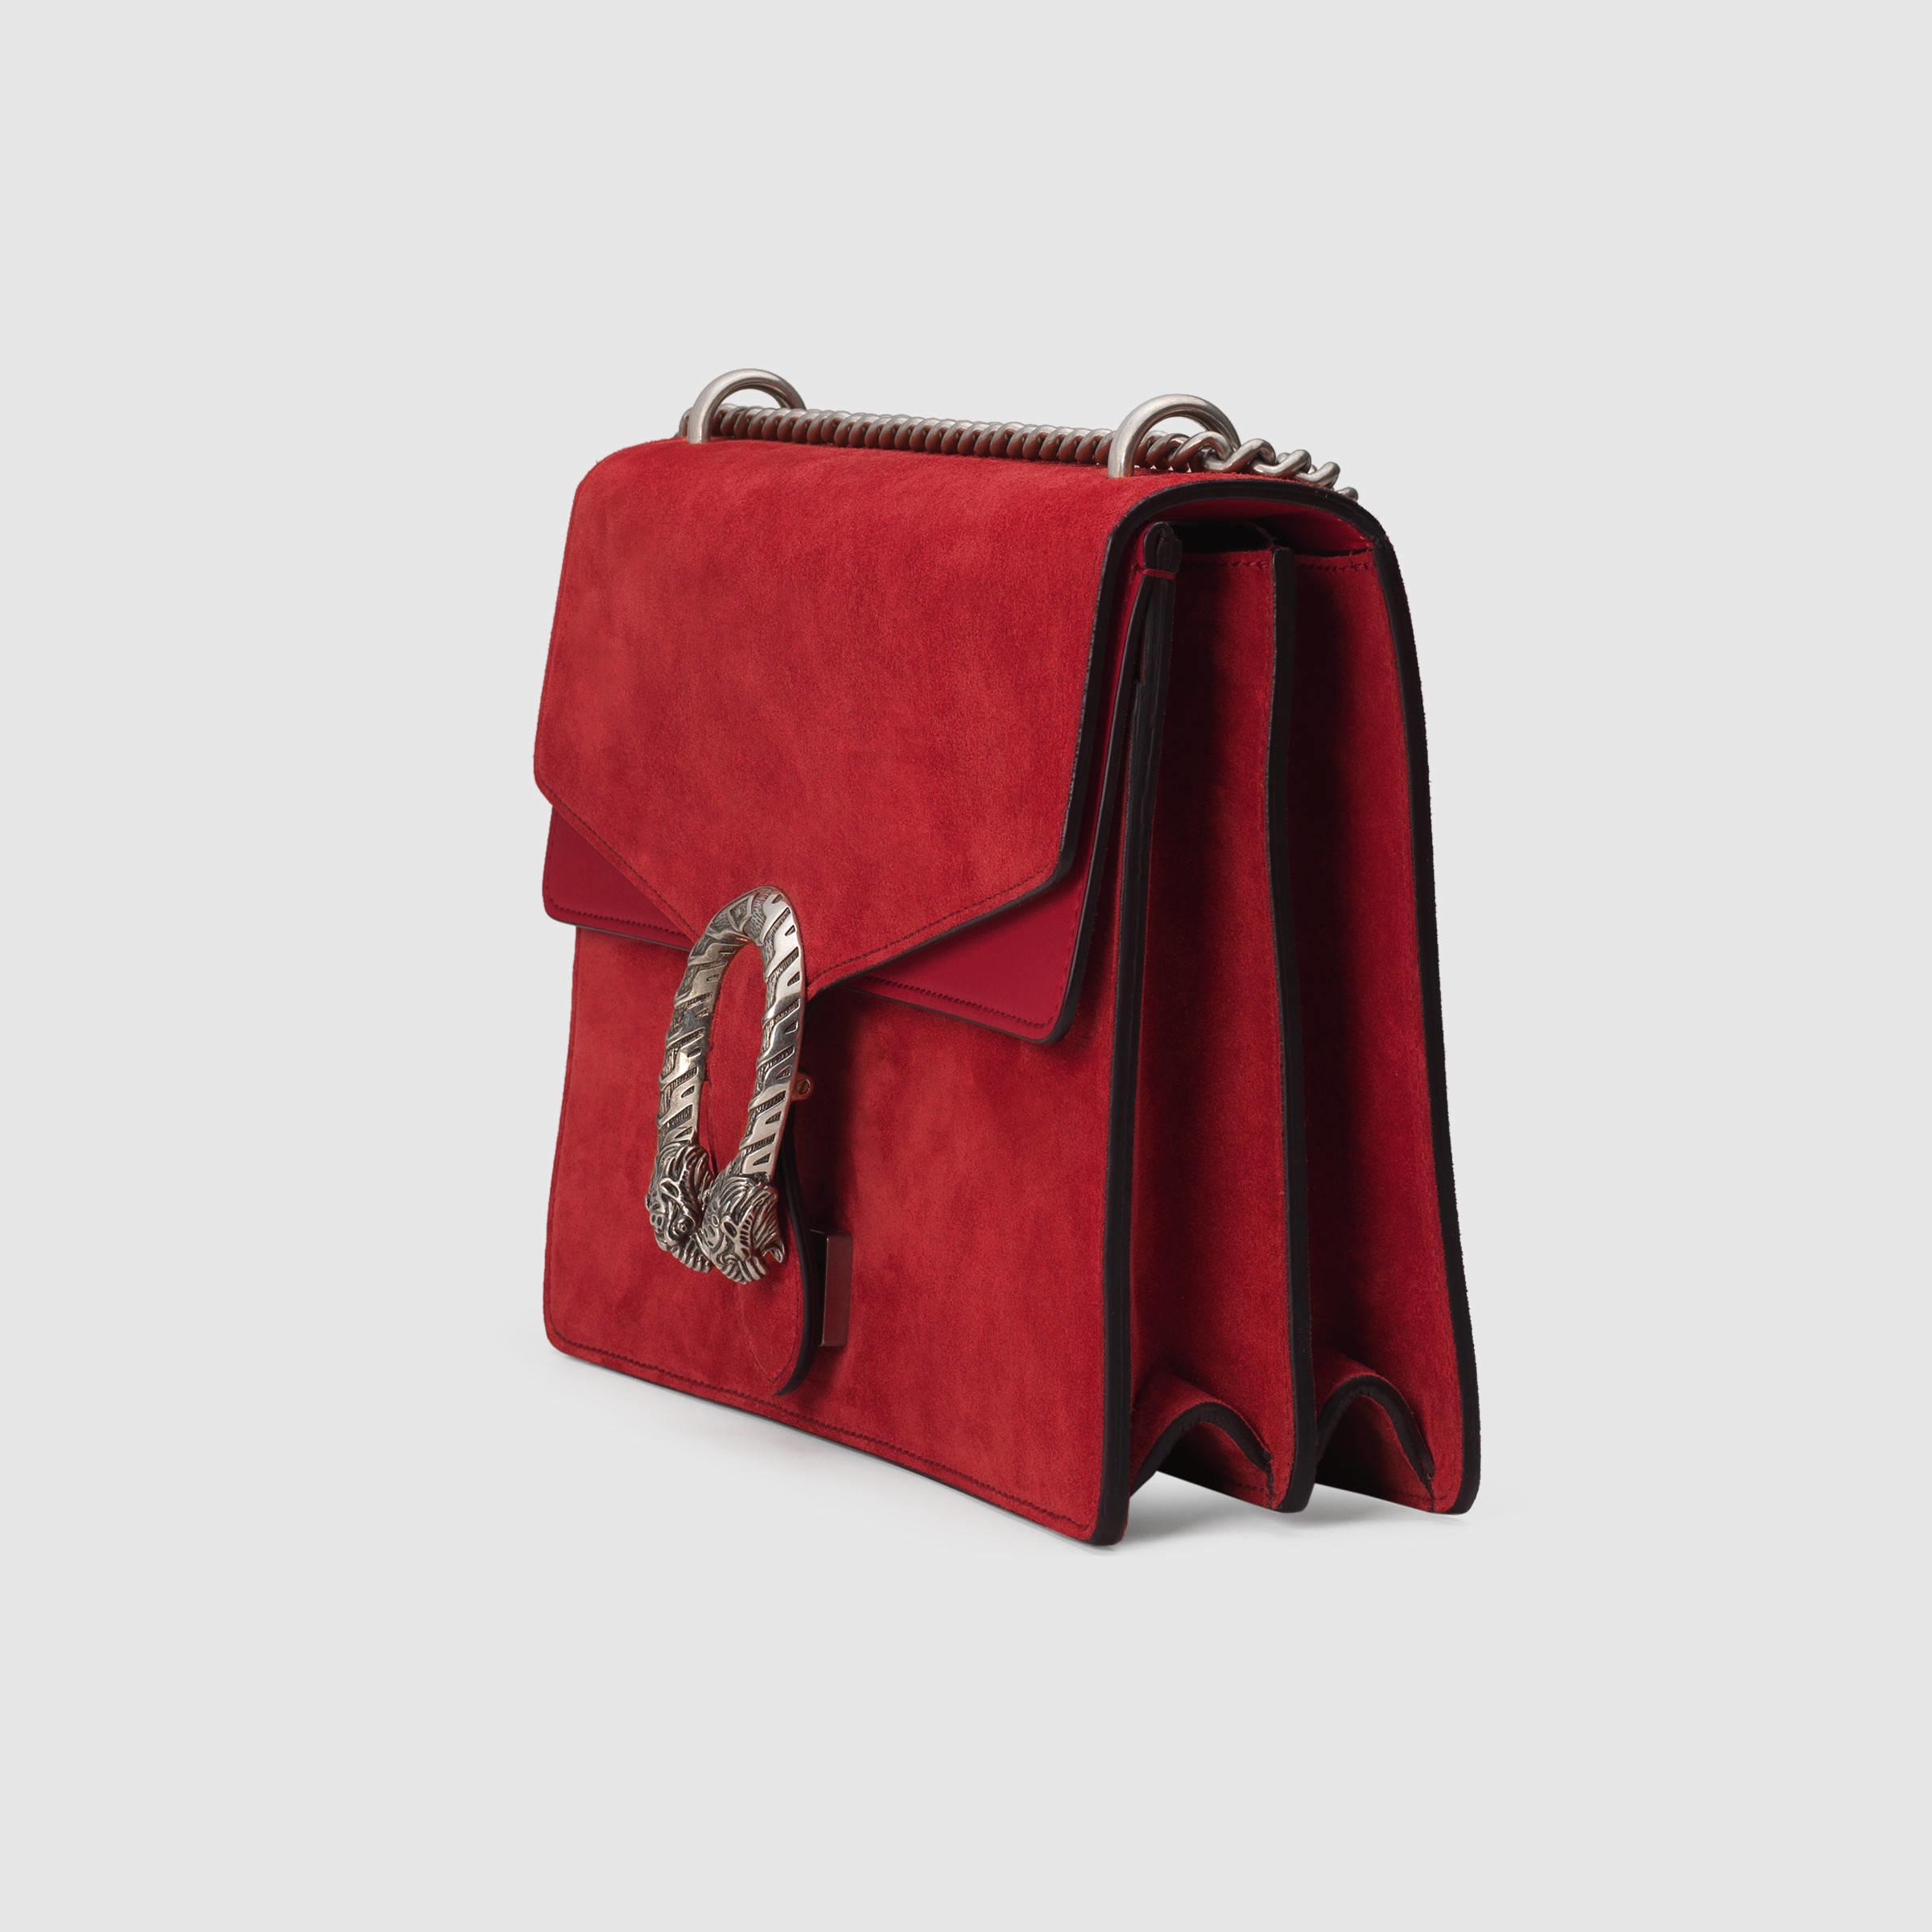 9476630b0395 Lyst Gucci Dionysus Suede Shoulder Bag In Red